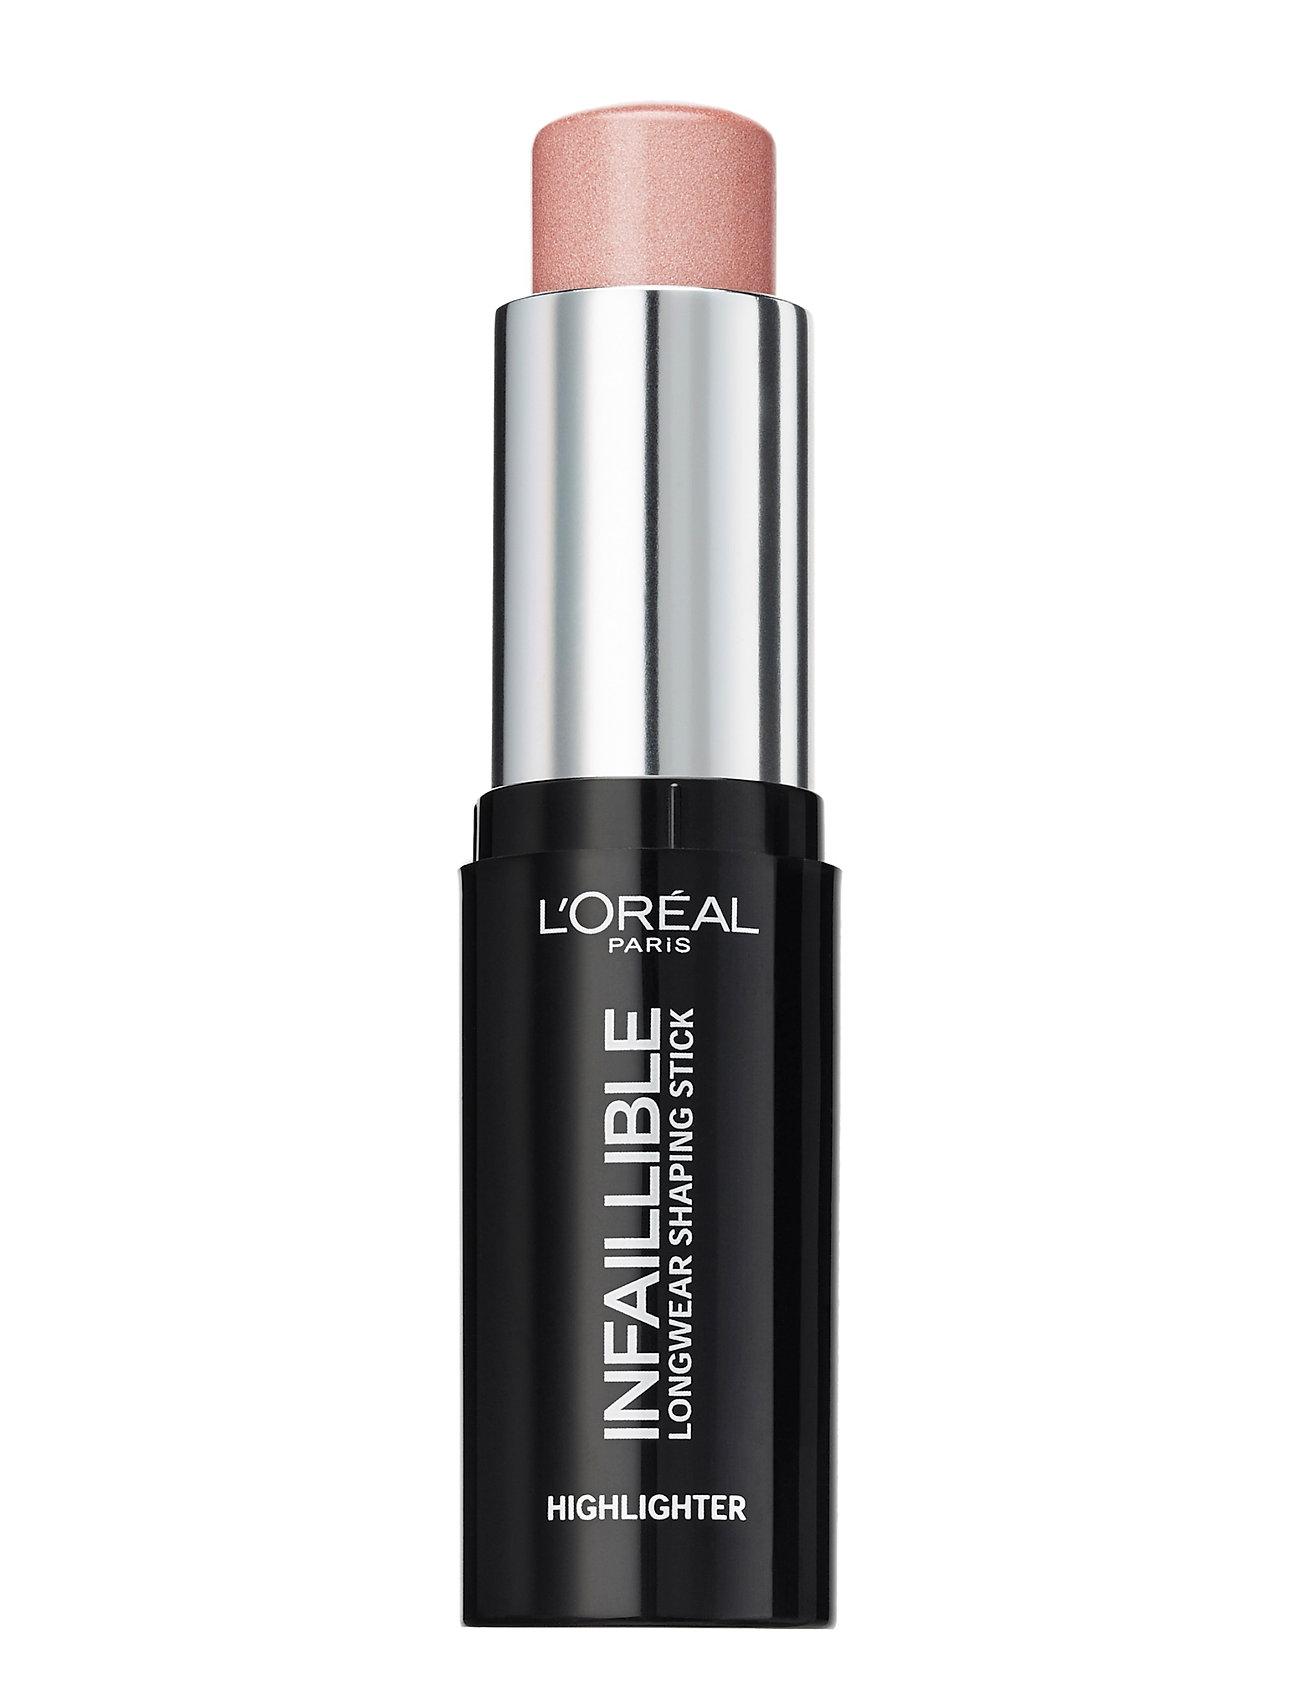 L'Oréal Paris Infallible Stick Highlighter - 501 OH MY JEWELS